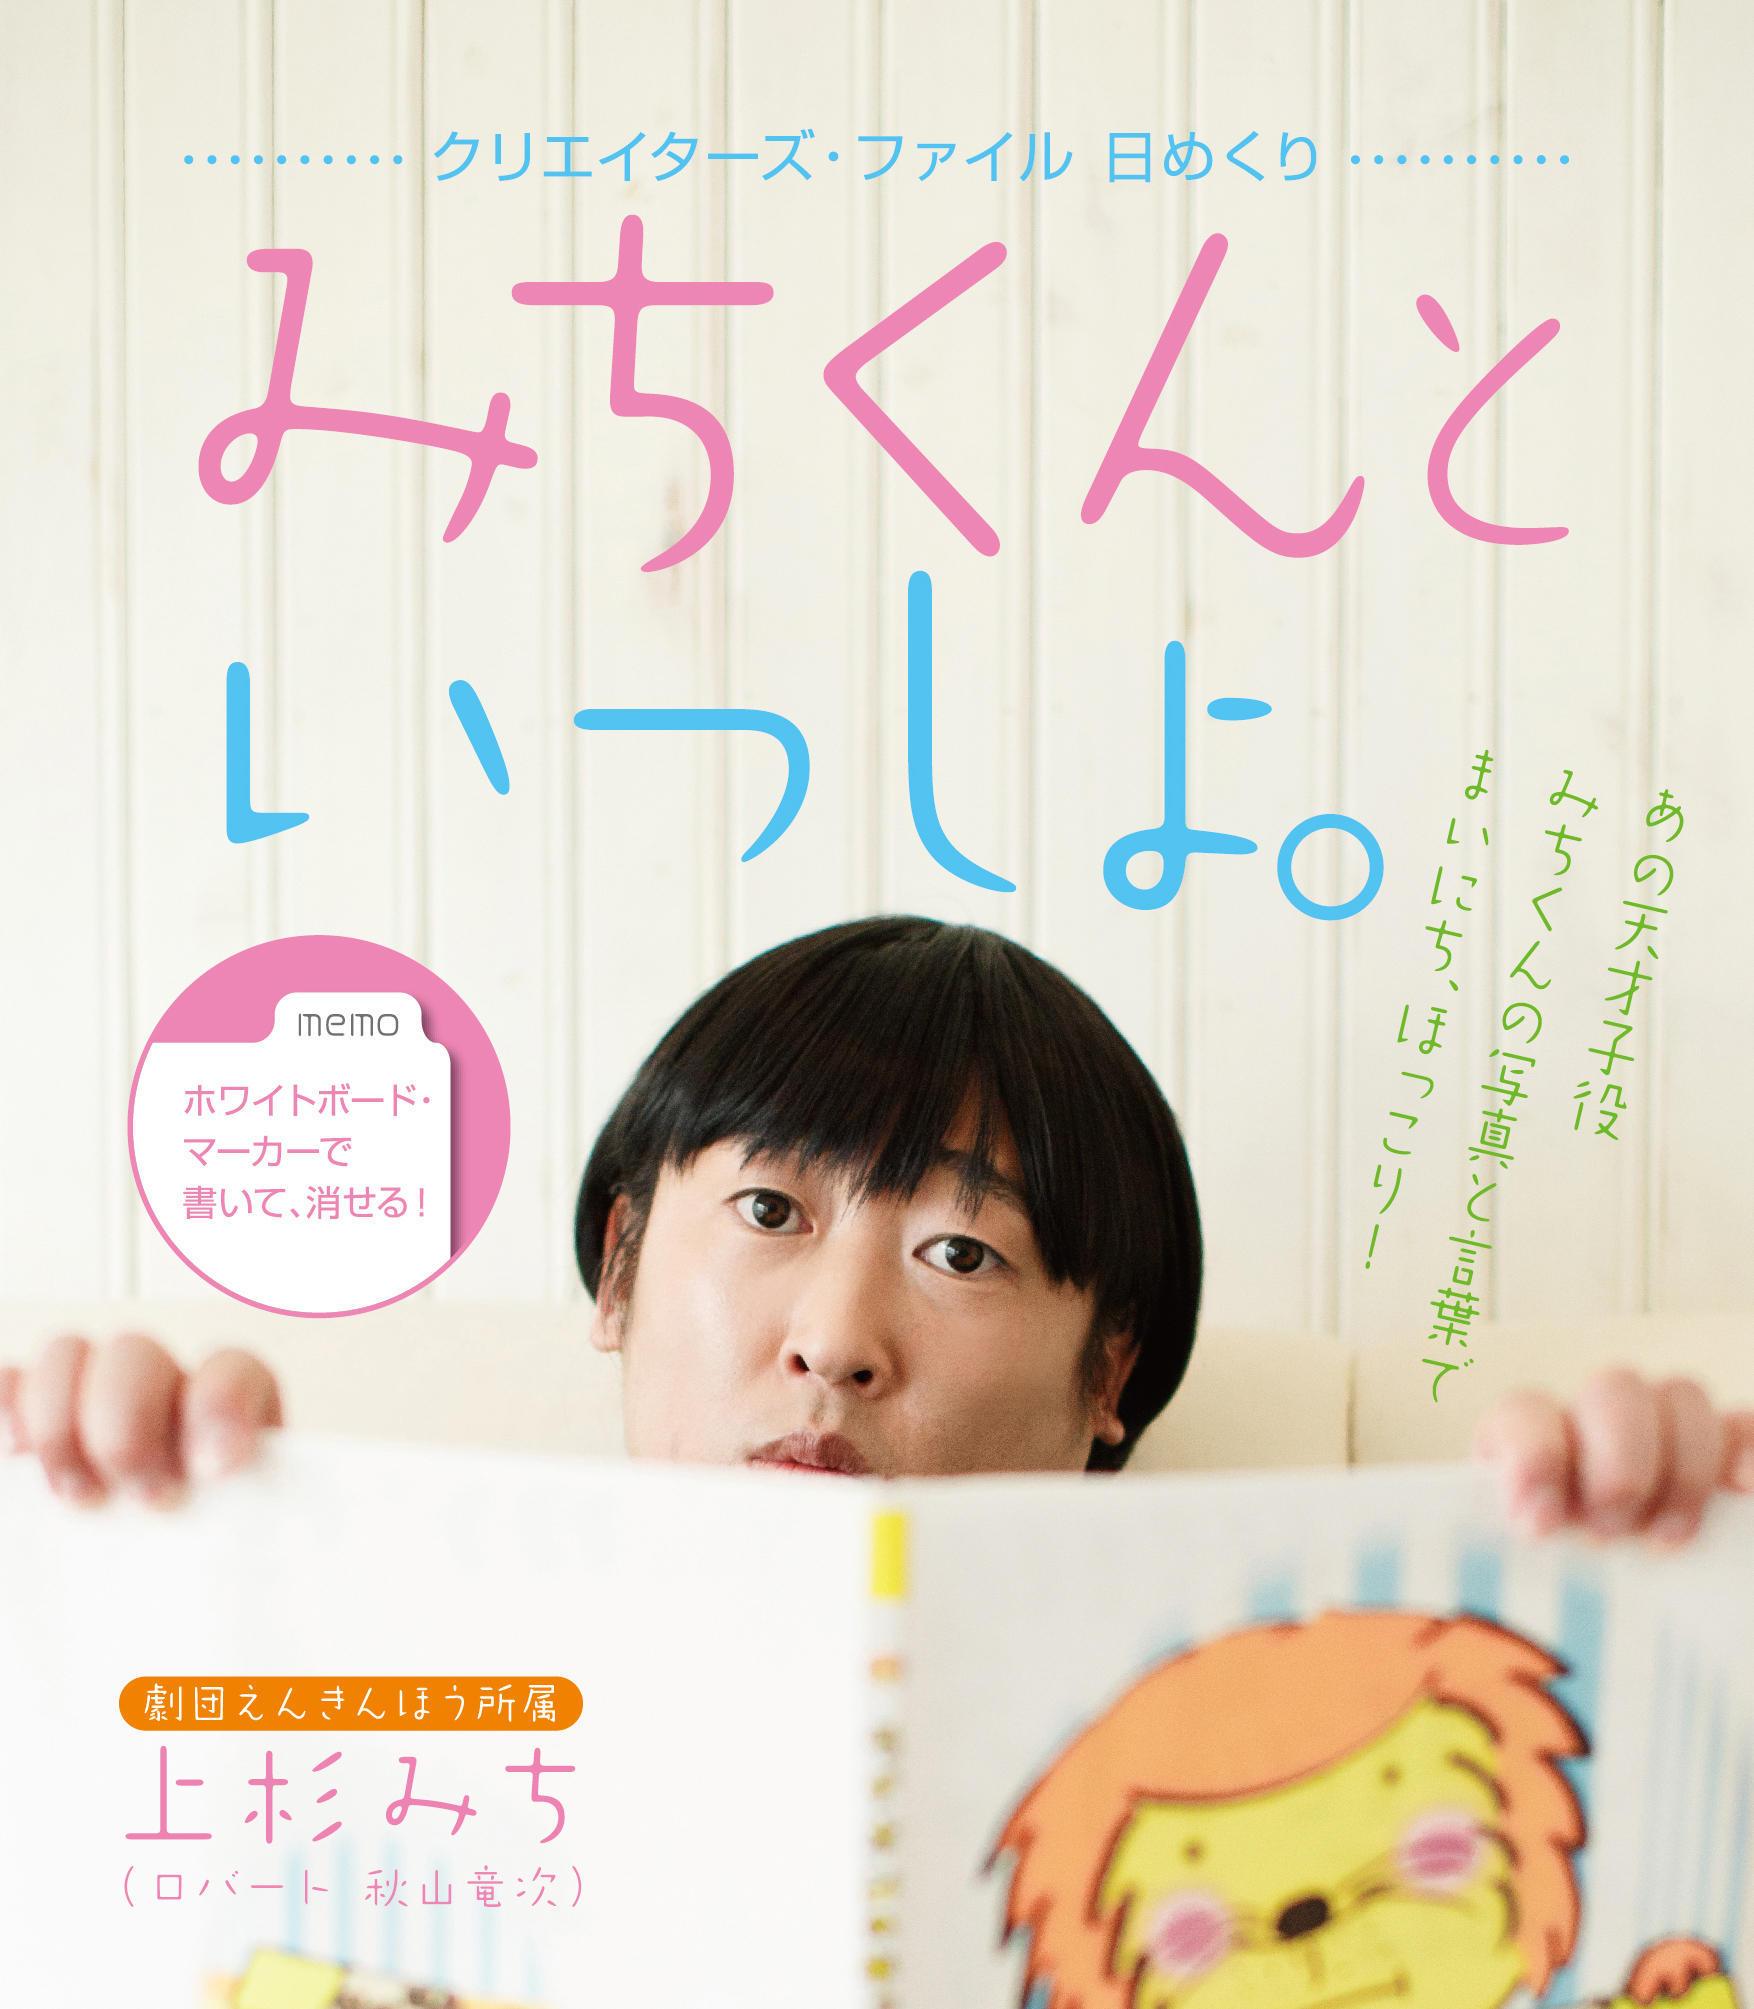 http://news.yoshimoto.co.jp/20170429002959-b3f45a0c08b818717b20976fd33849f875d6872b.jpg